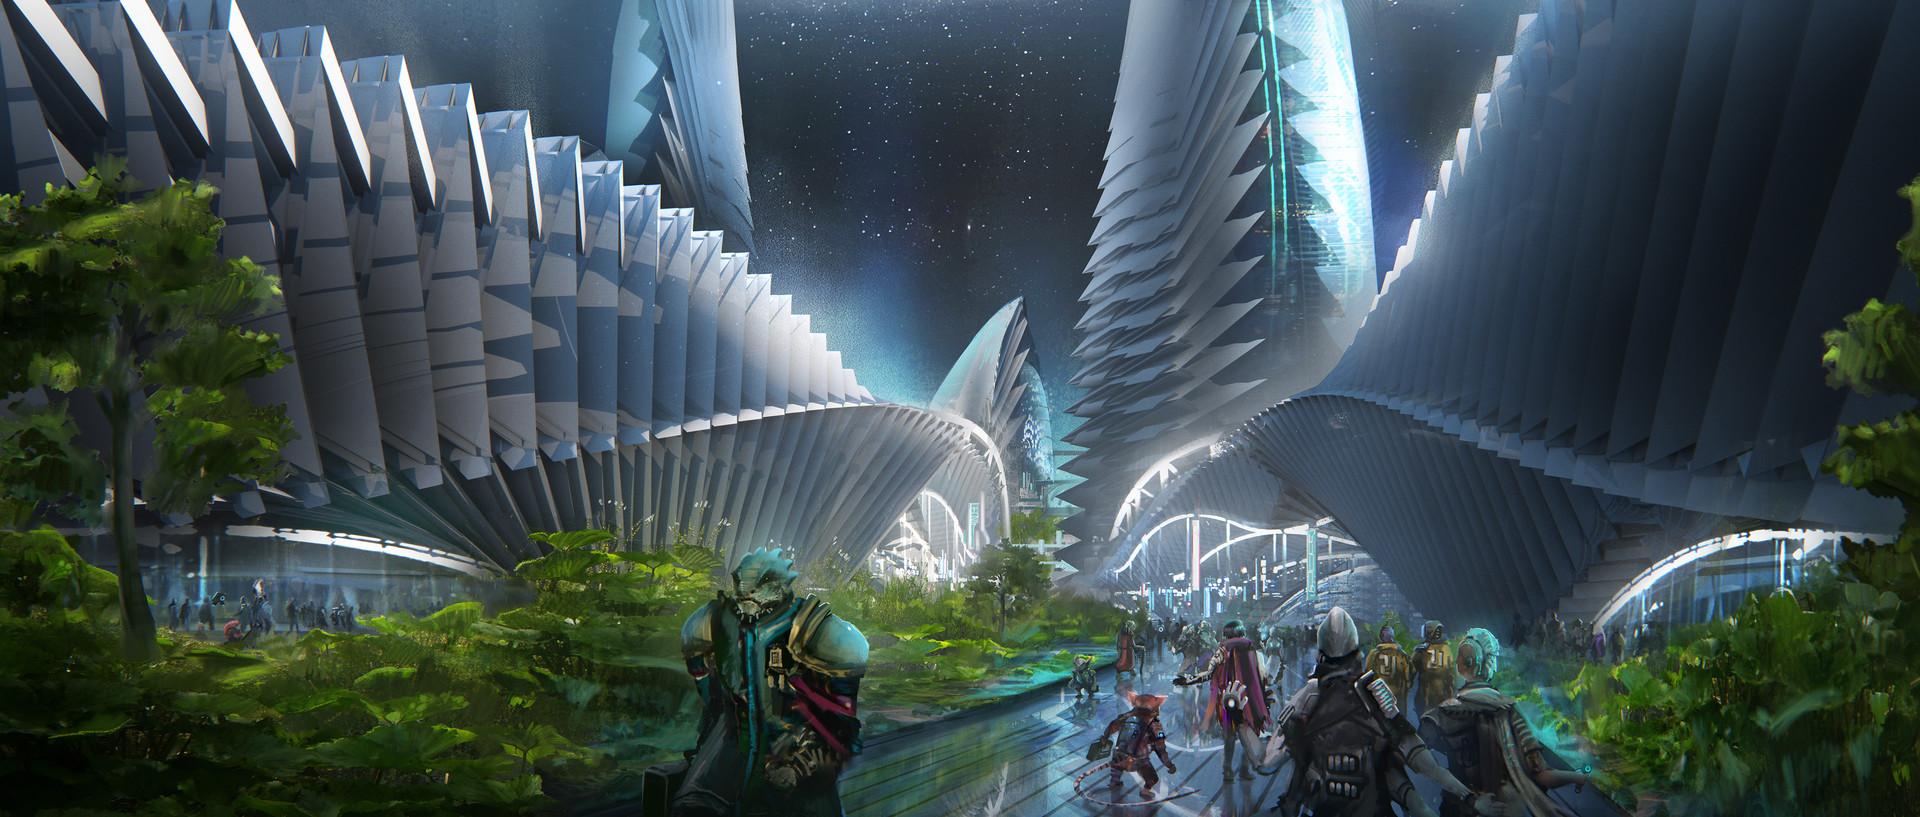 ArtStation - Starfinder Paizo publishing - Absalom Station